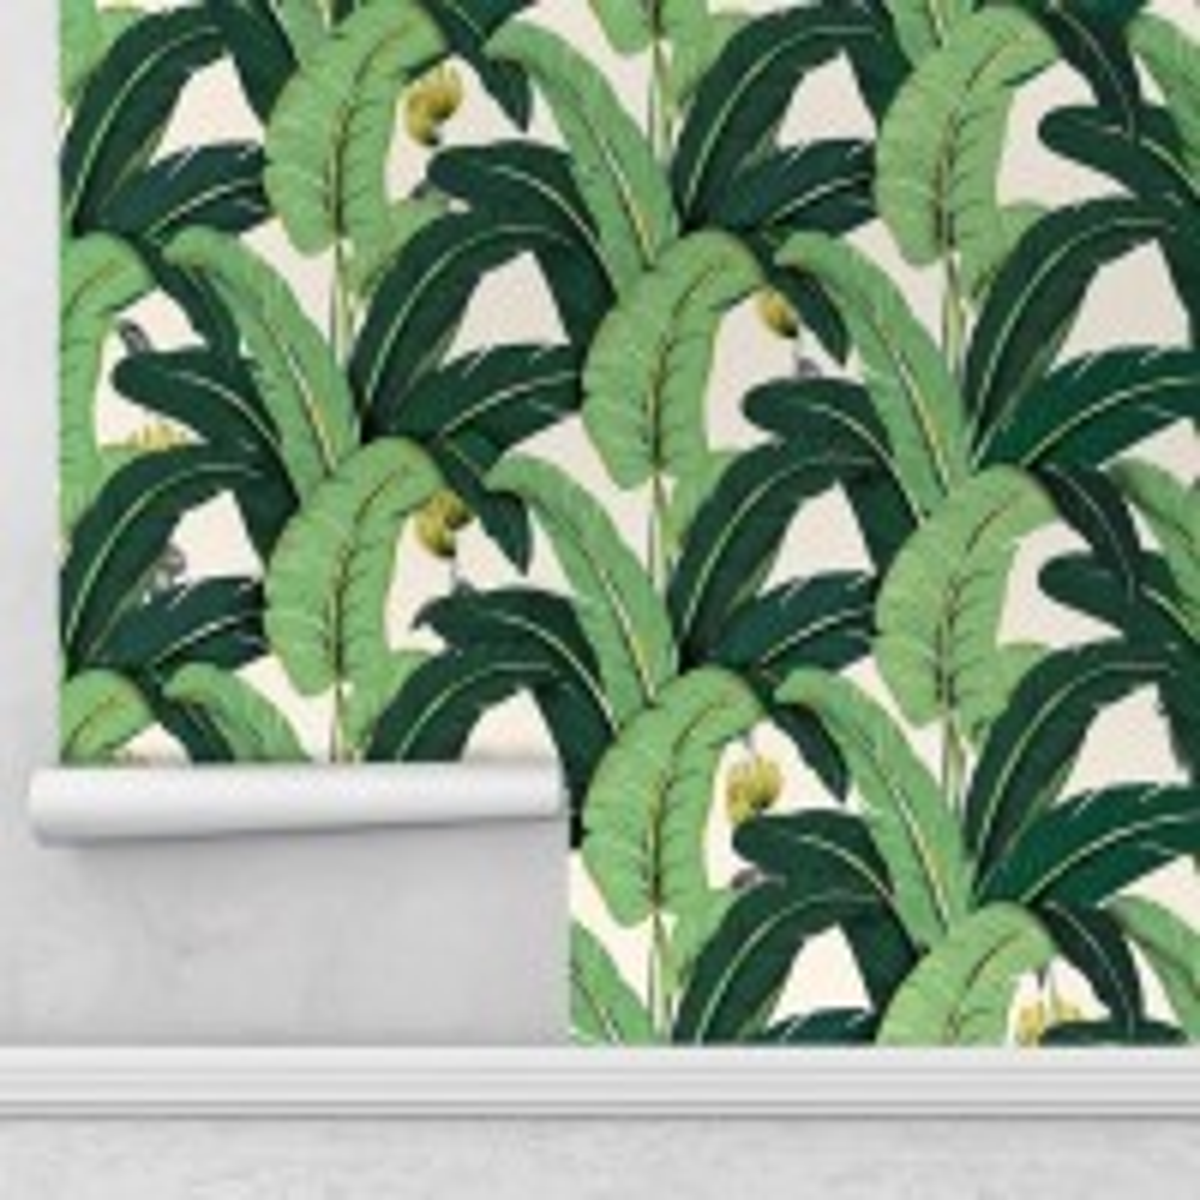 Banana Leaf Pattern Wallpaper Mural